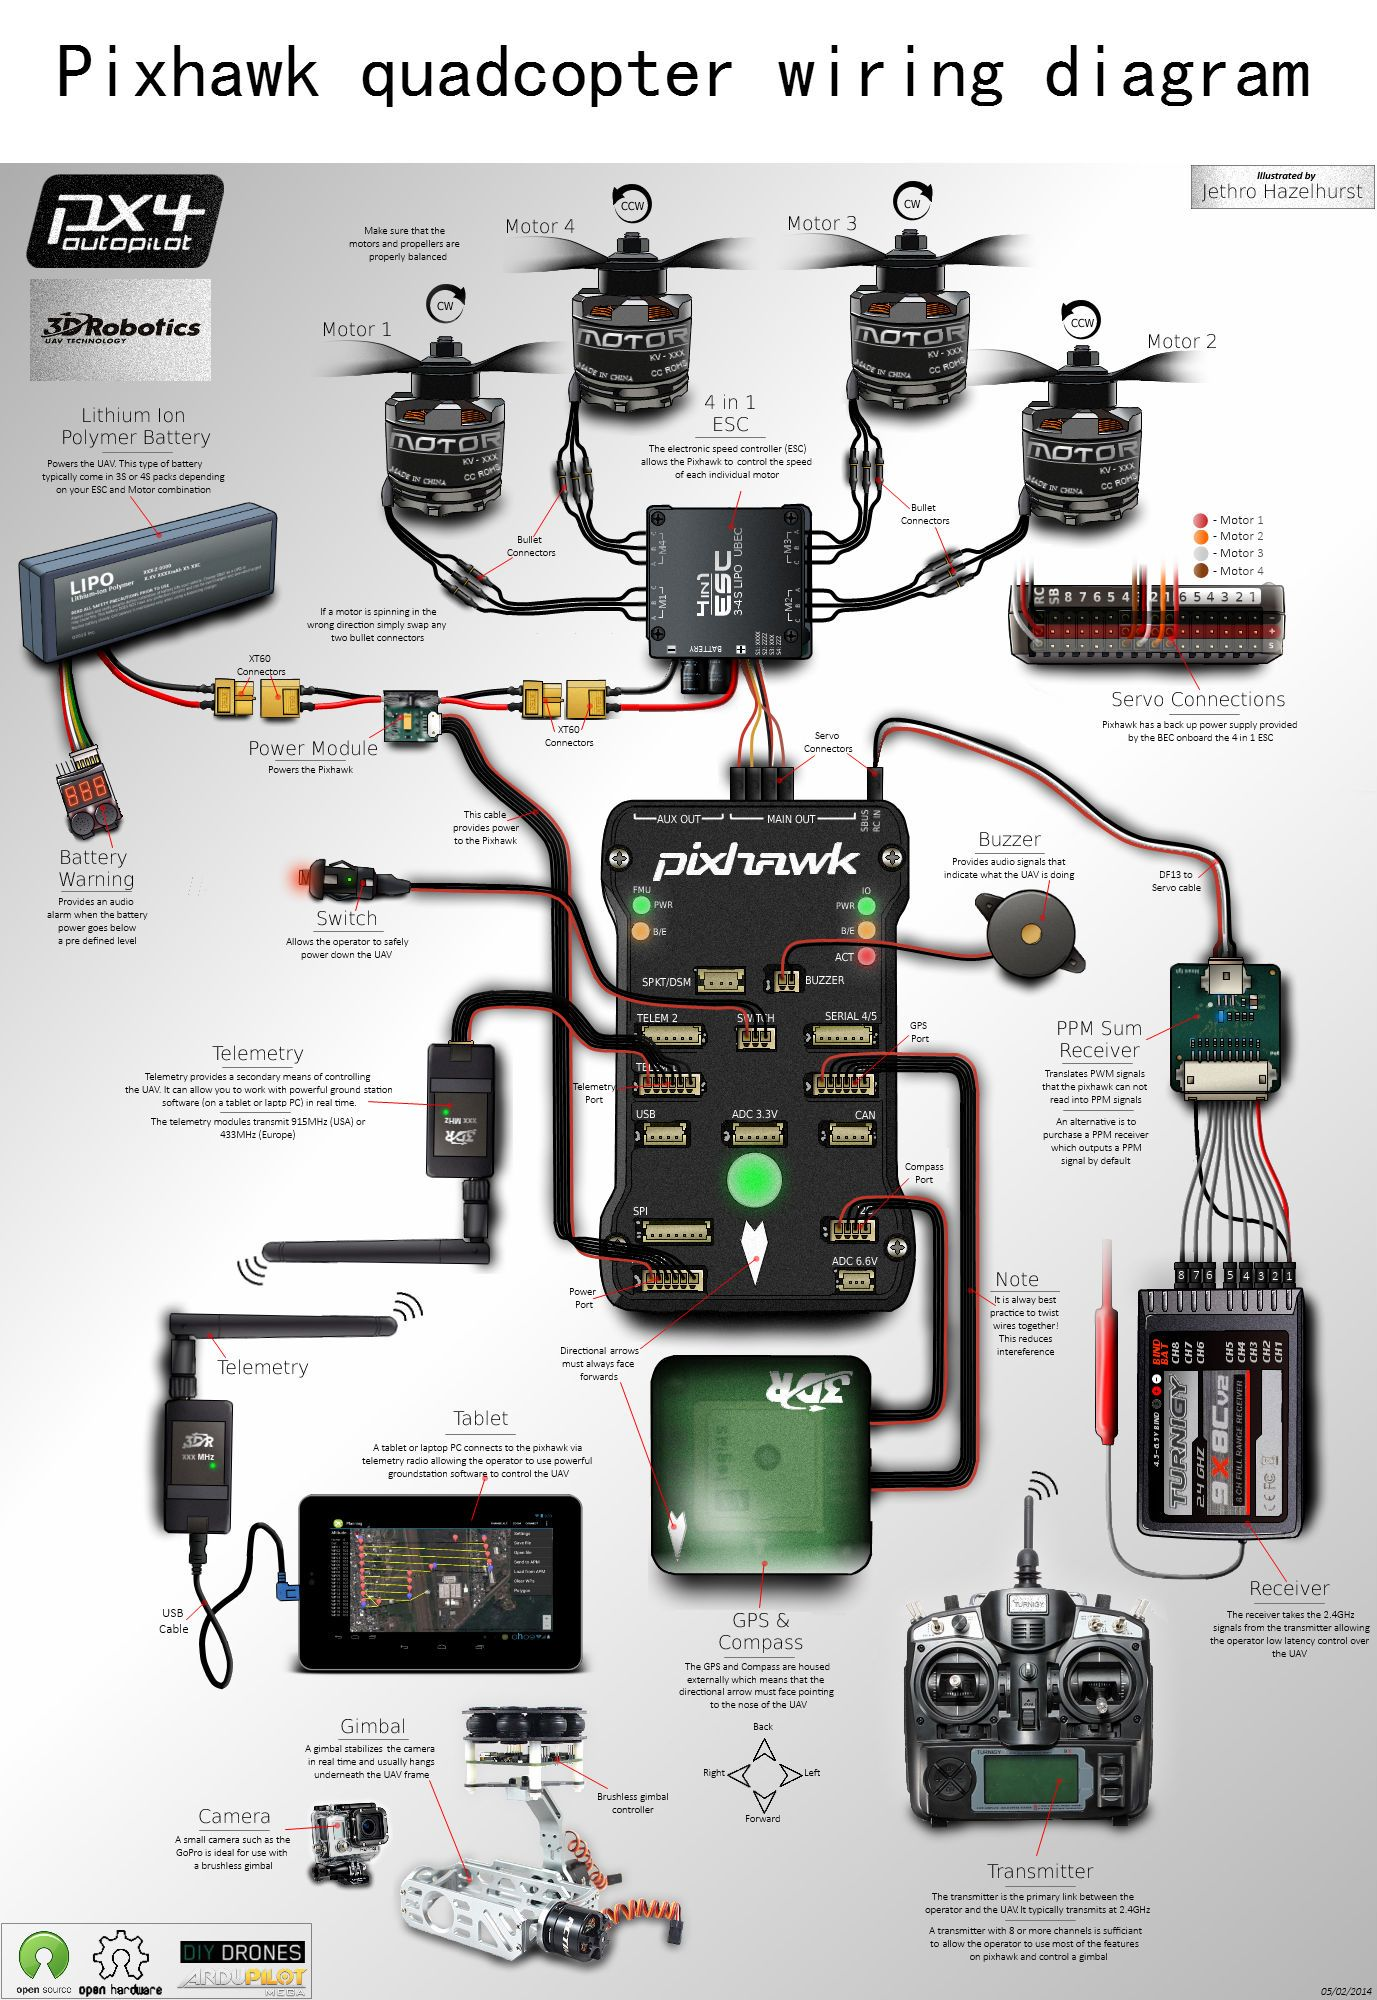 Pixhawk quadcopter wiring | Diy quadcopter | Drone